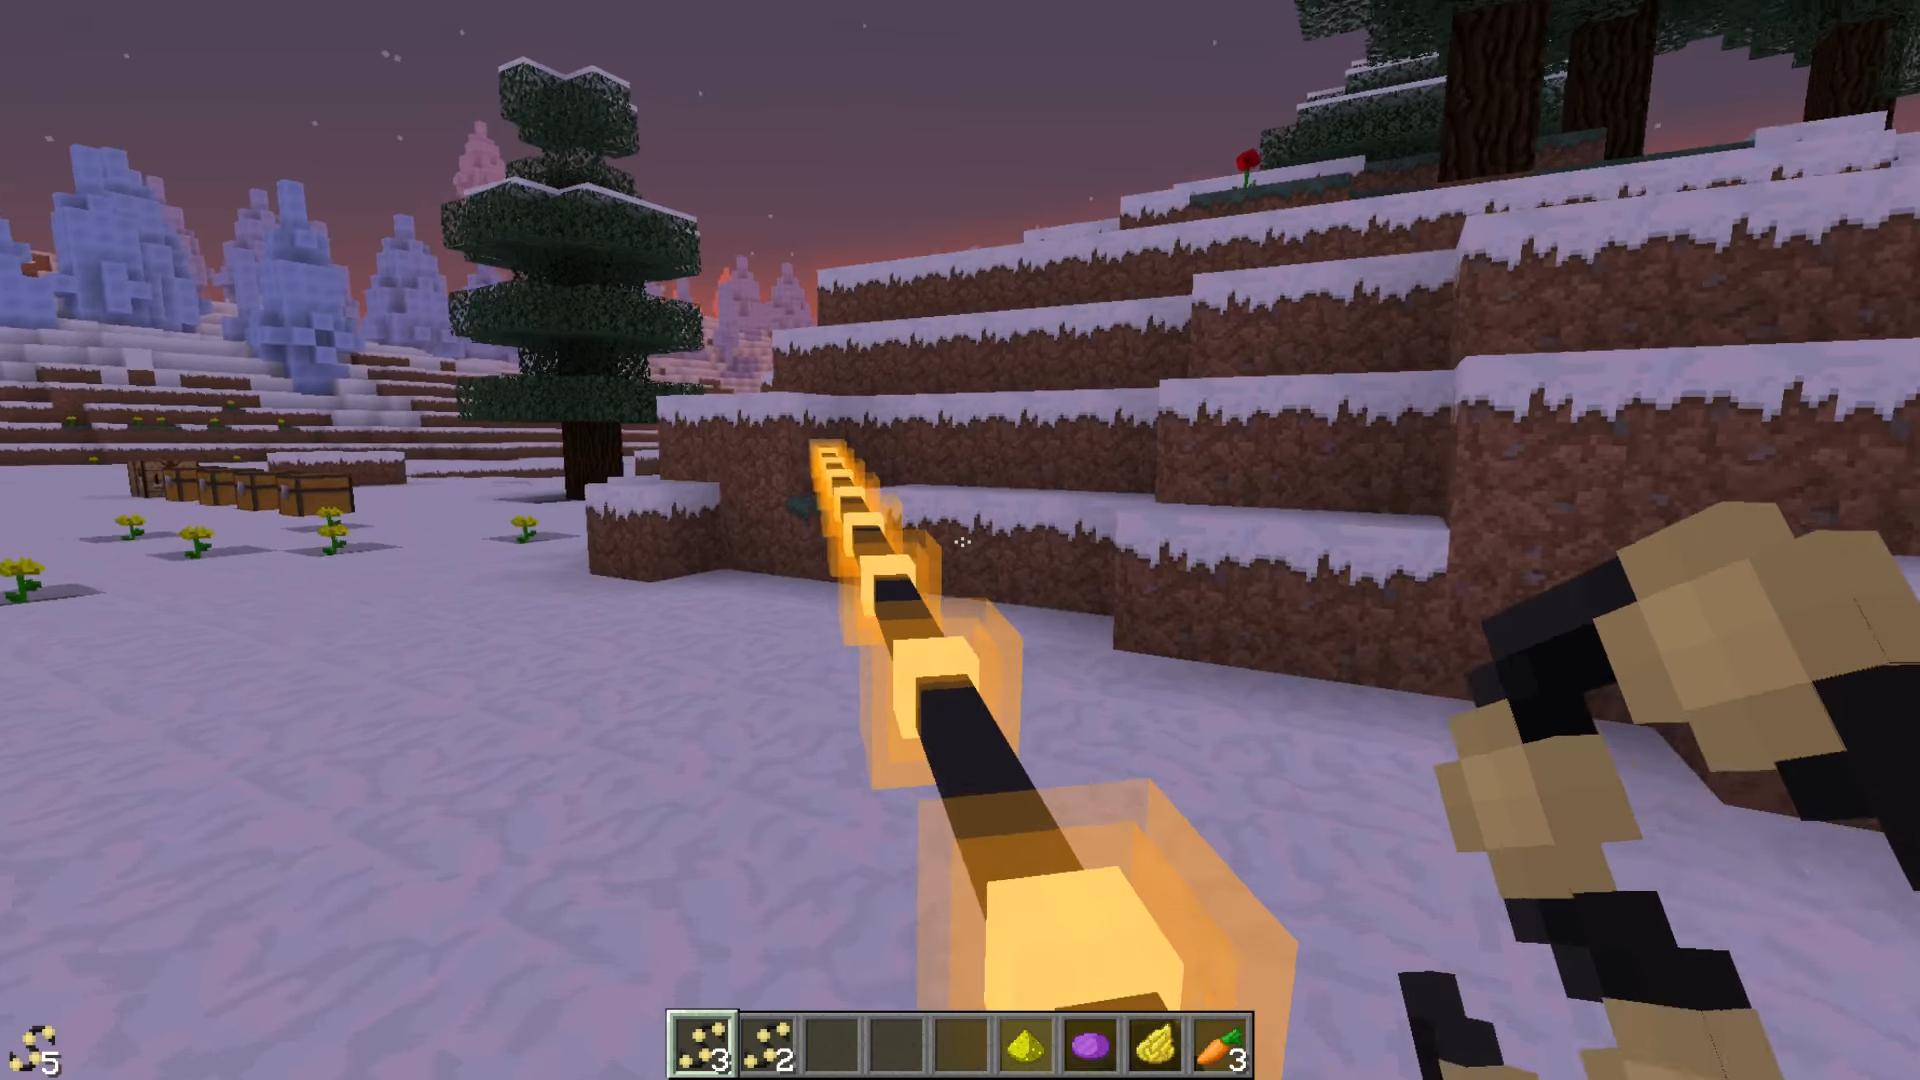 Мод «Fairy Lights» (Новогодние гирлянды) - скриншот 7